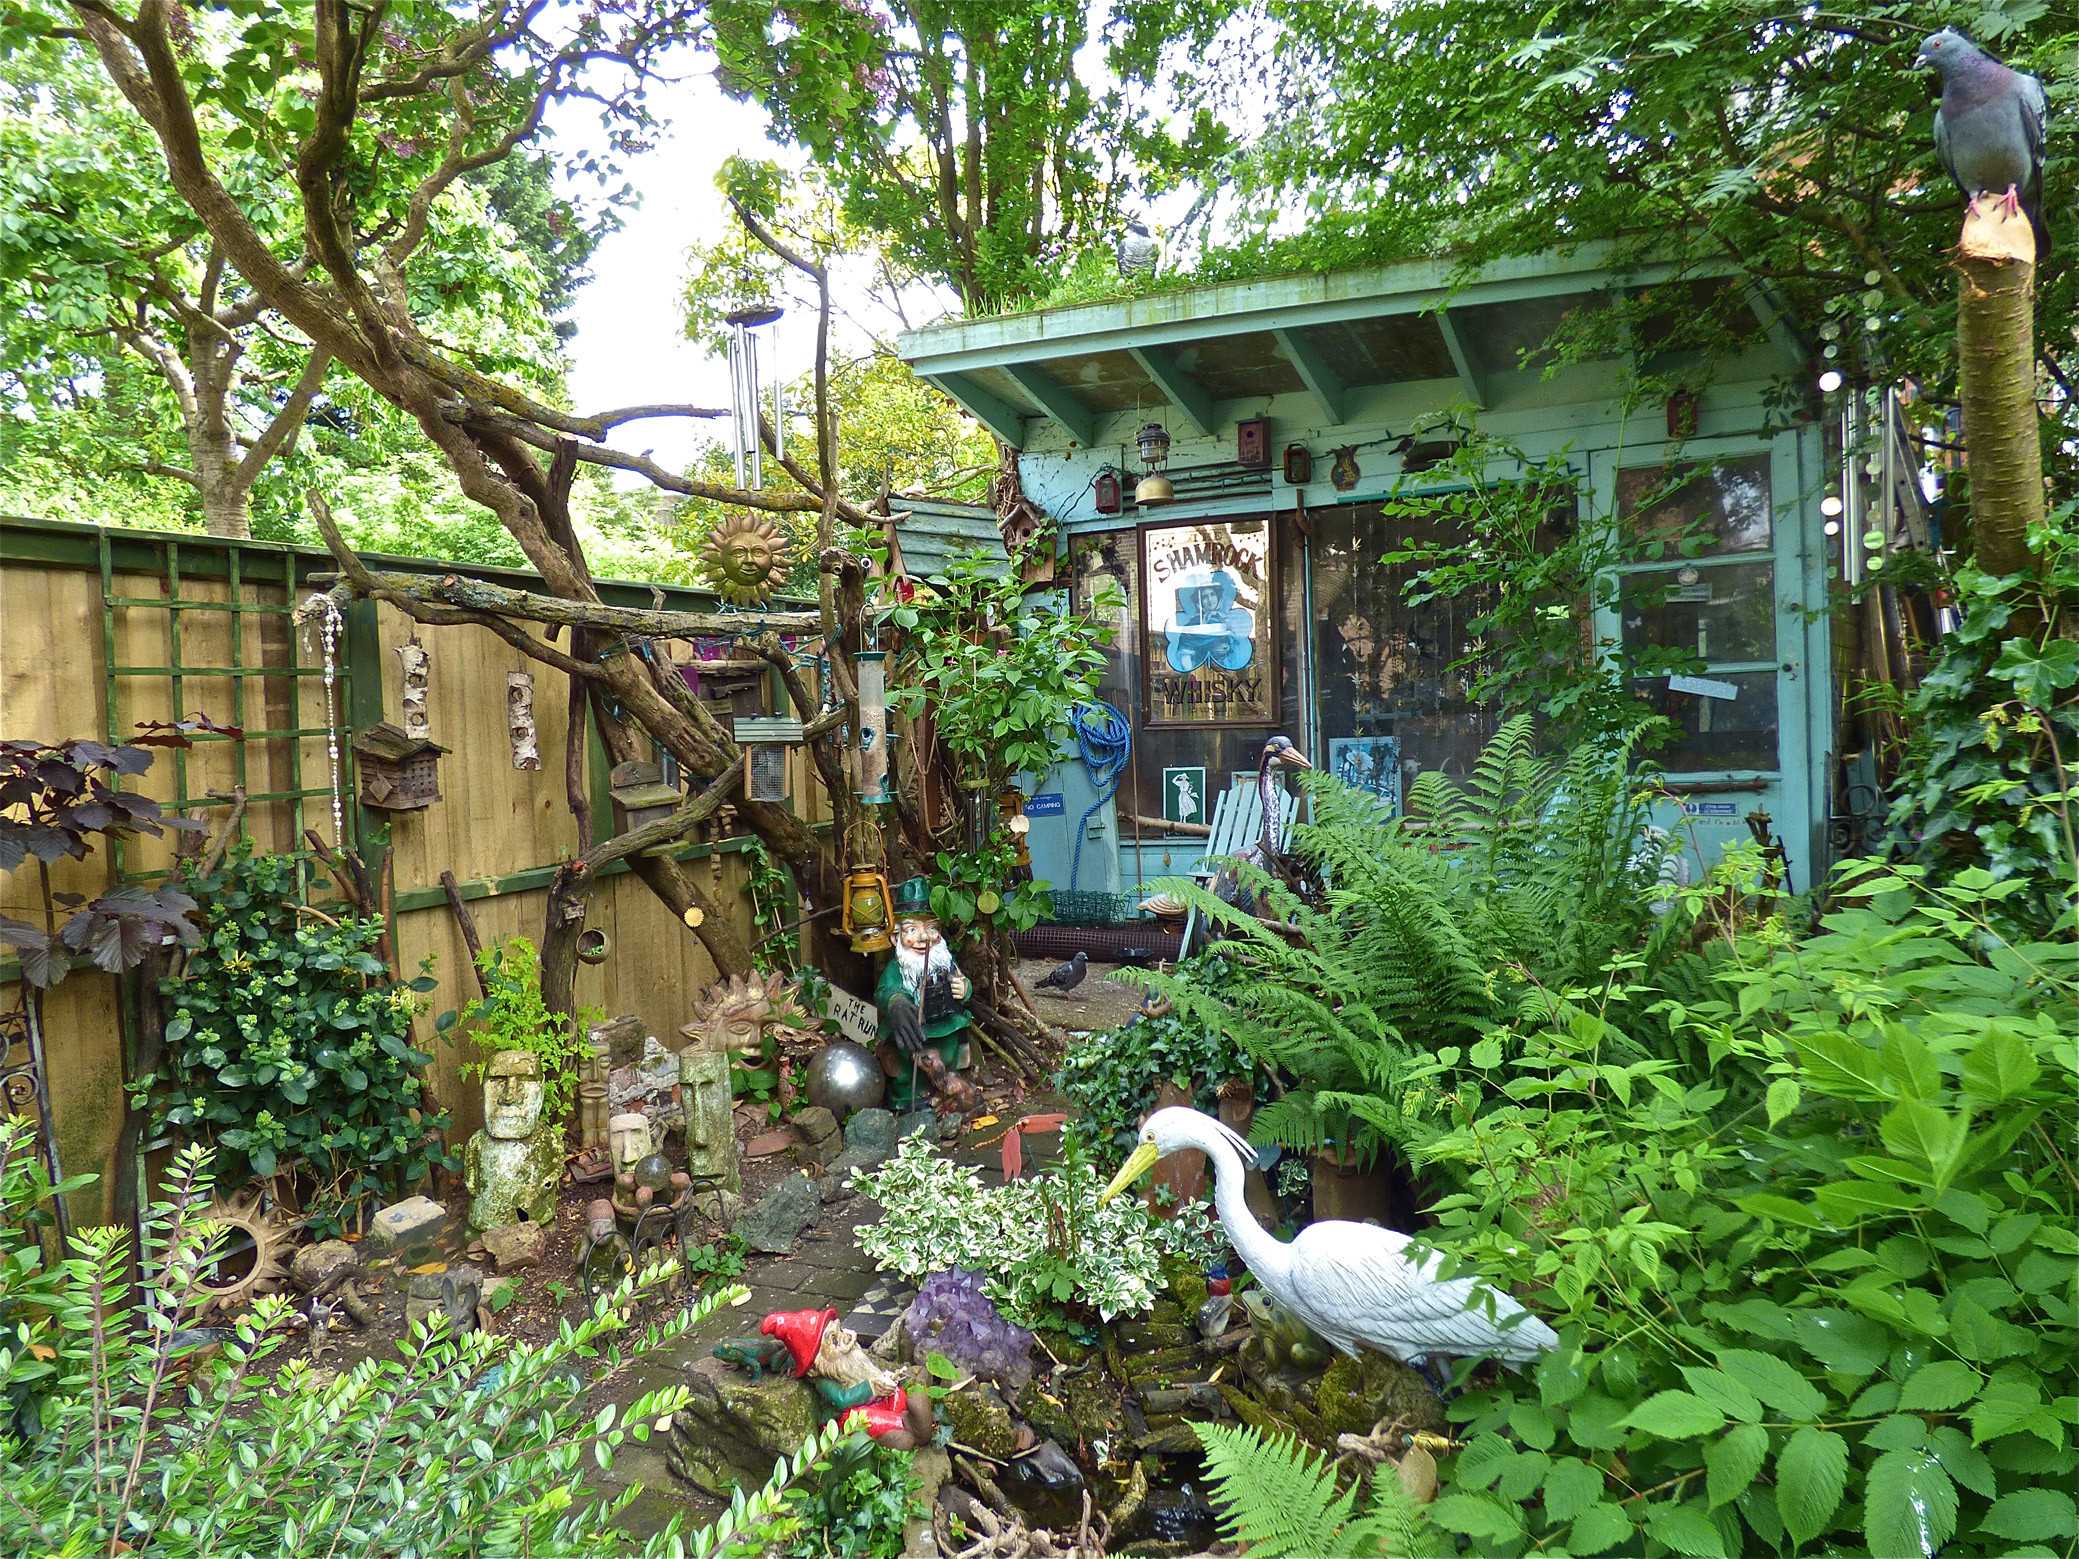 A 'ludicrous' garden (Bill Oddie/PA)